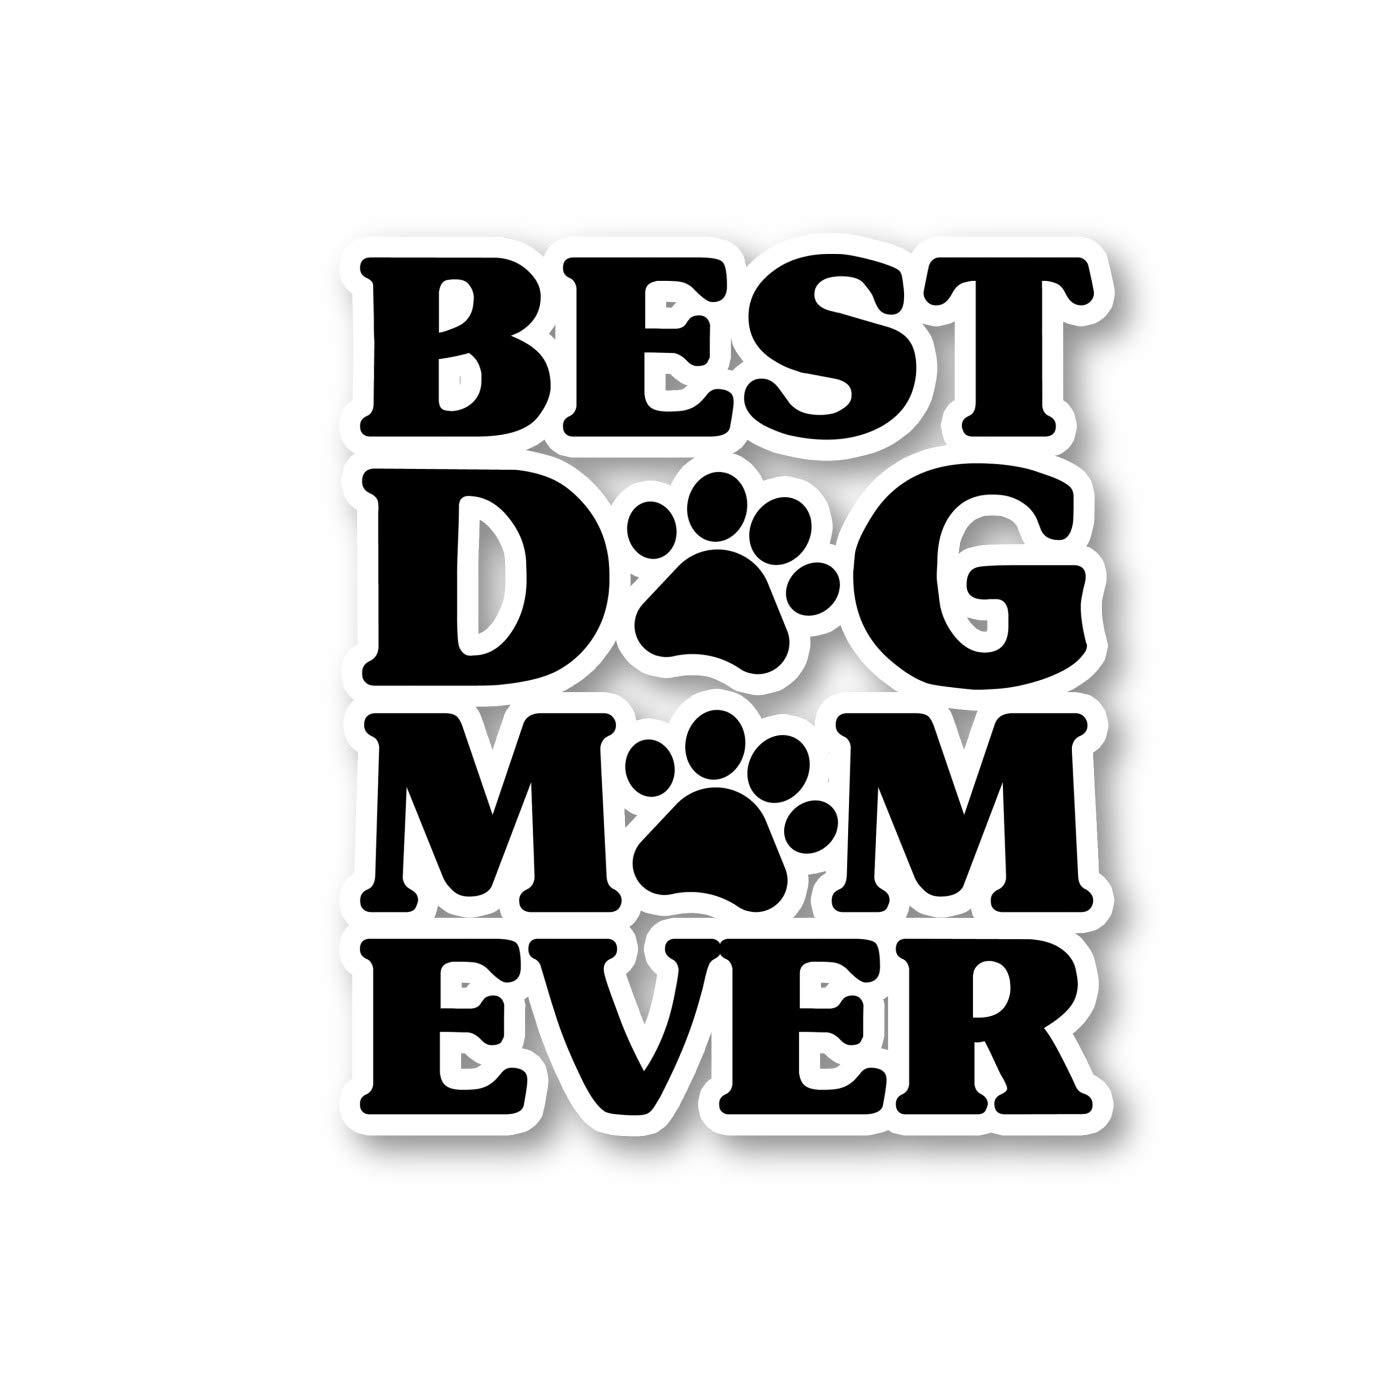 Amazon com best dog mom ever paw print sticker dog stickers laptop stickers 2 5 vinyl decal laptop phone tablet vinyl decal sticker s1128